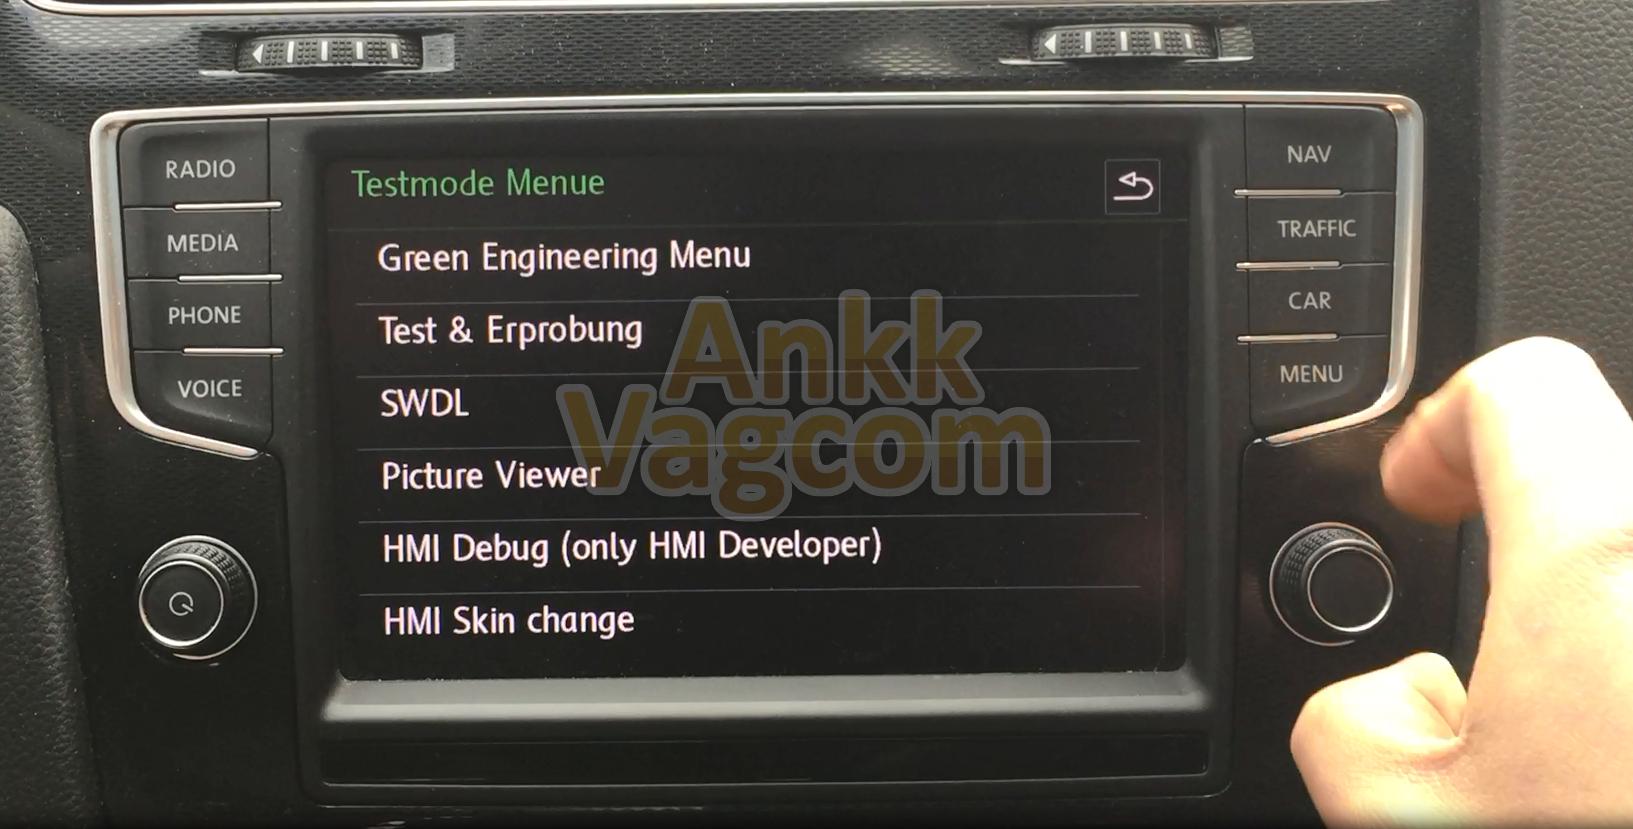 Ankk vagcom_vw_discover_pro_mib1_gte_testmode_menue ankk vagcom_vw_discover_pro_mib1_gte_green_engineering_menu